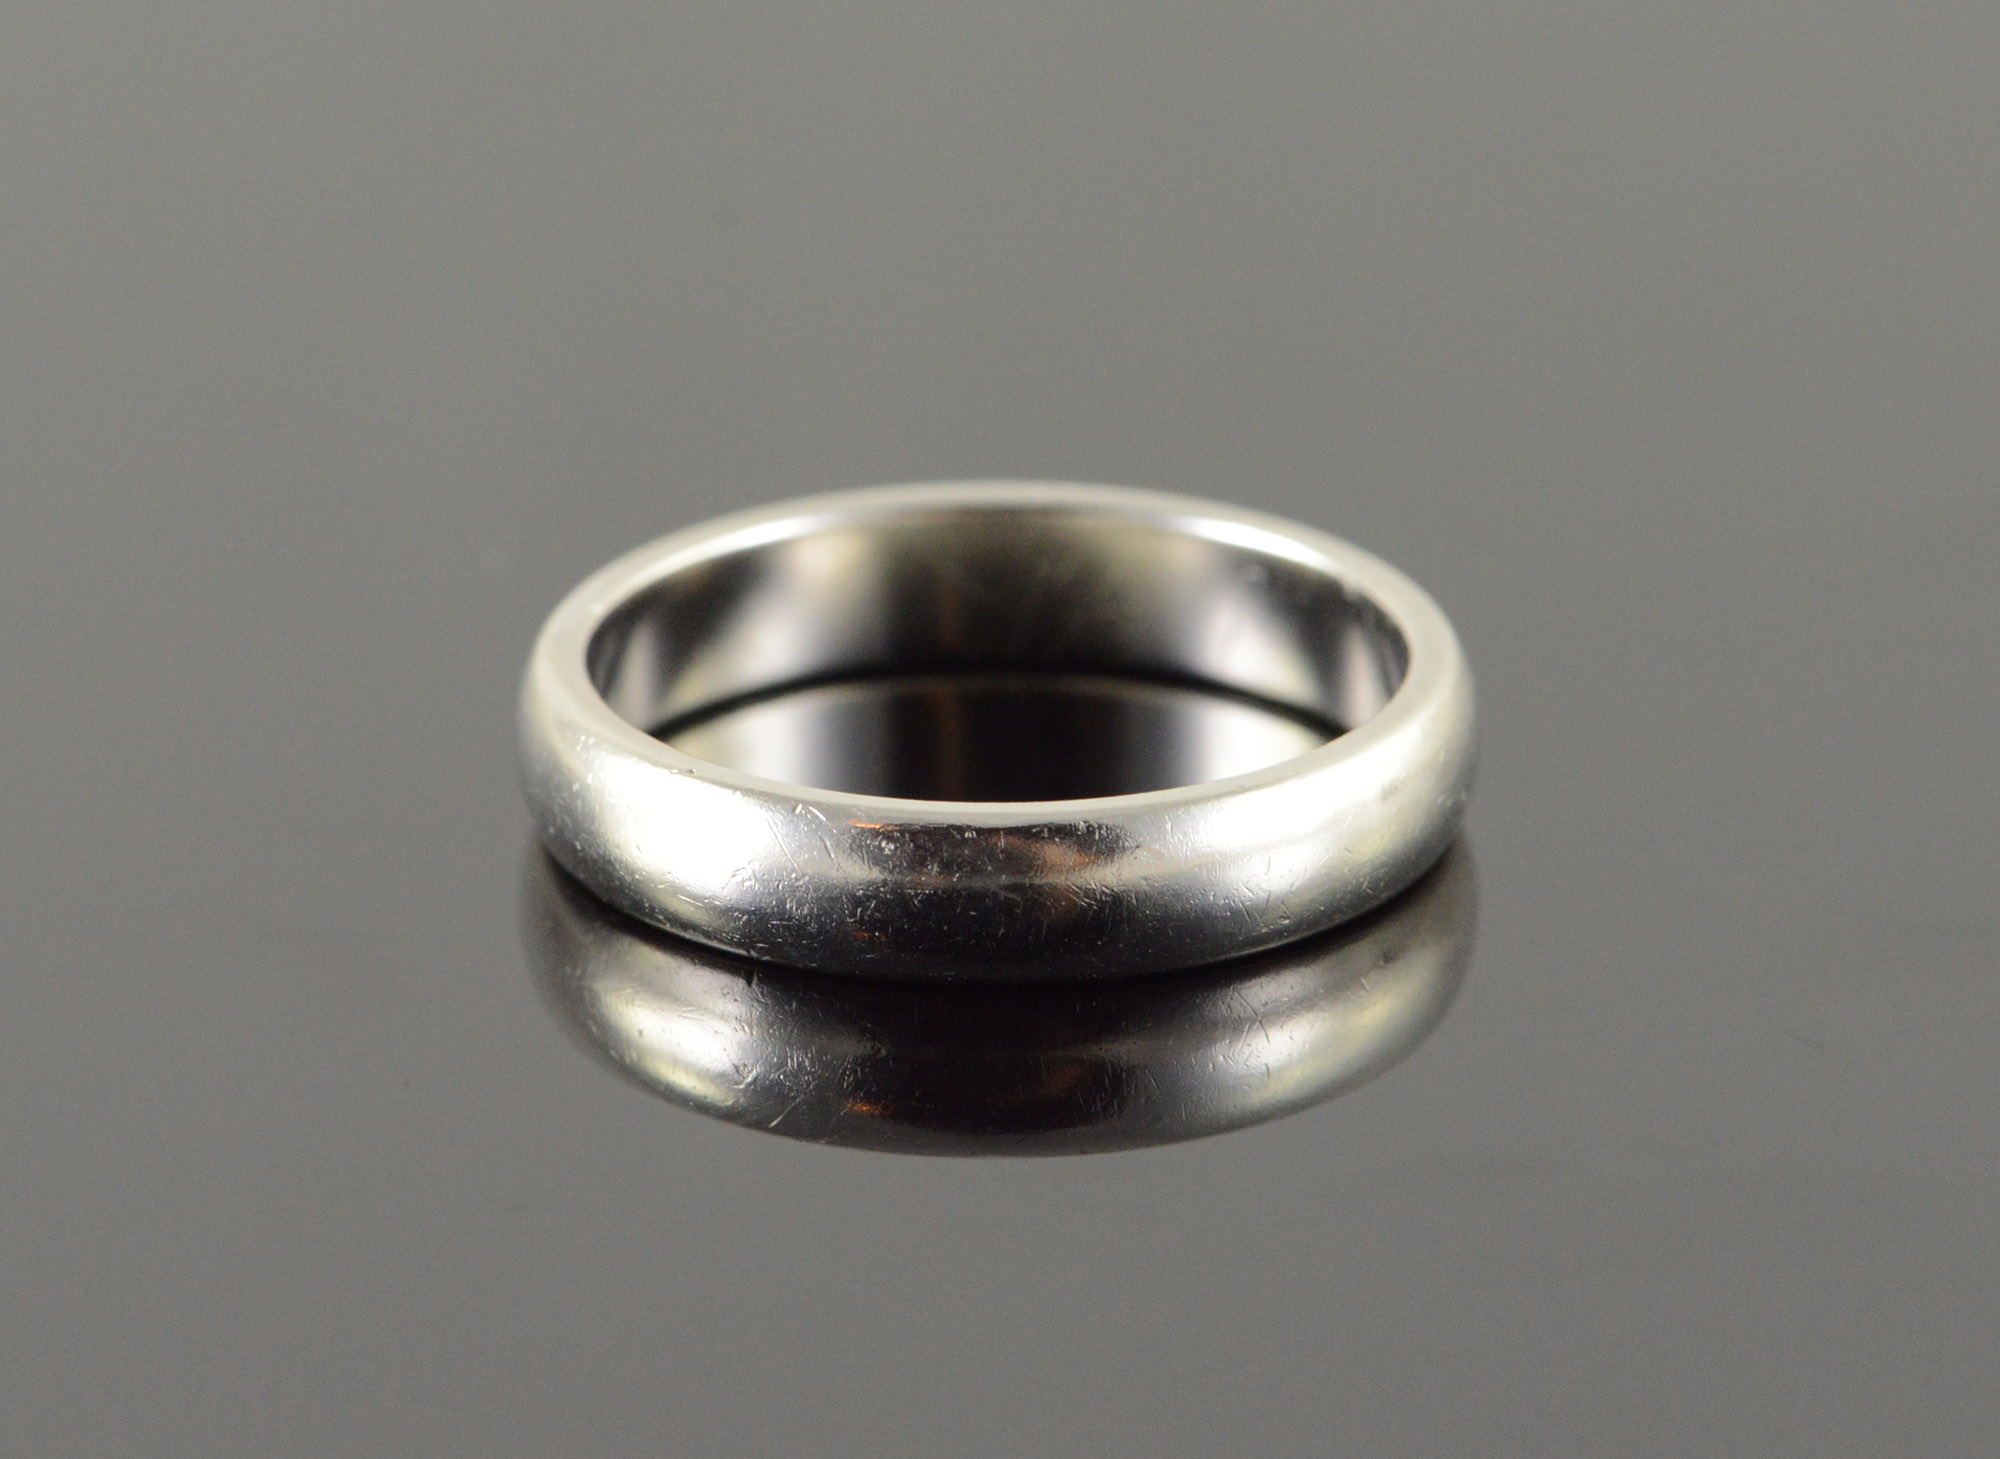 d98c3861f 10.2g Platinum Tiffany & Co 4.5mm Plain Wedding Band Men's Ring, Size 10.5